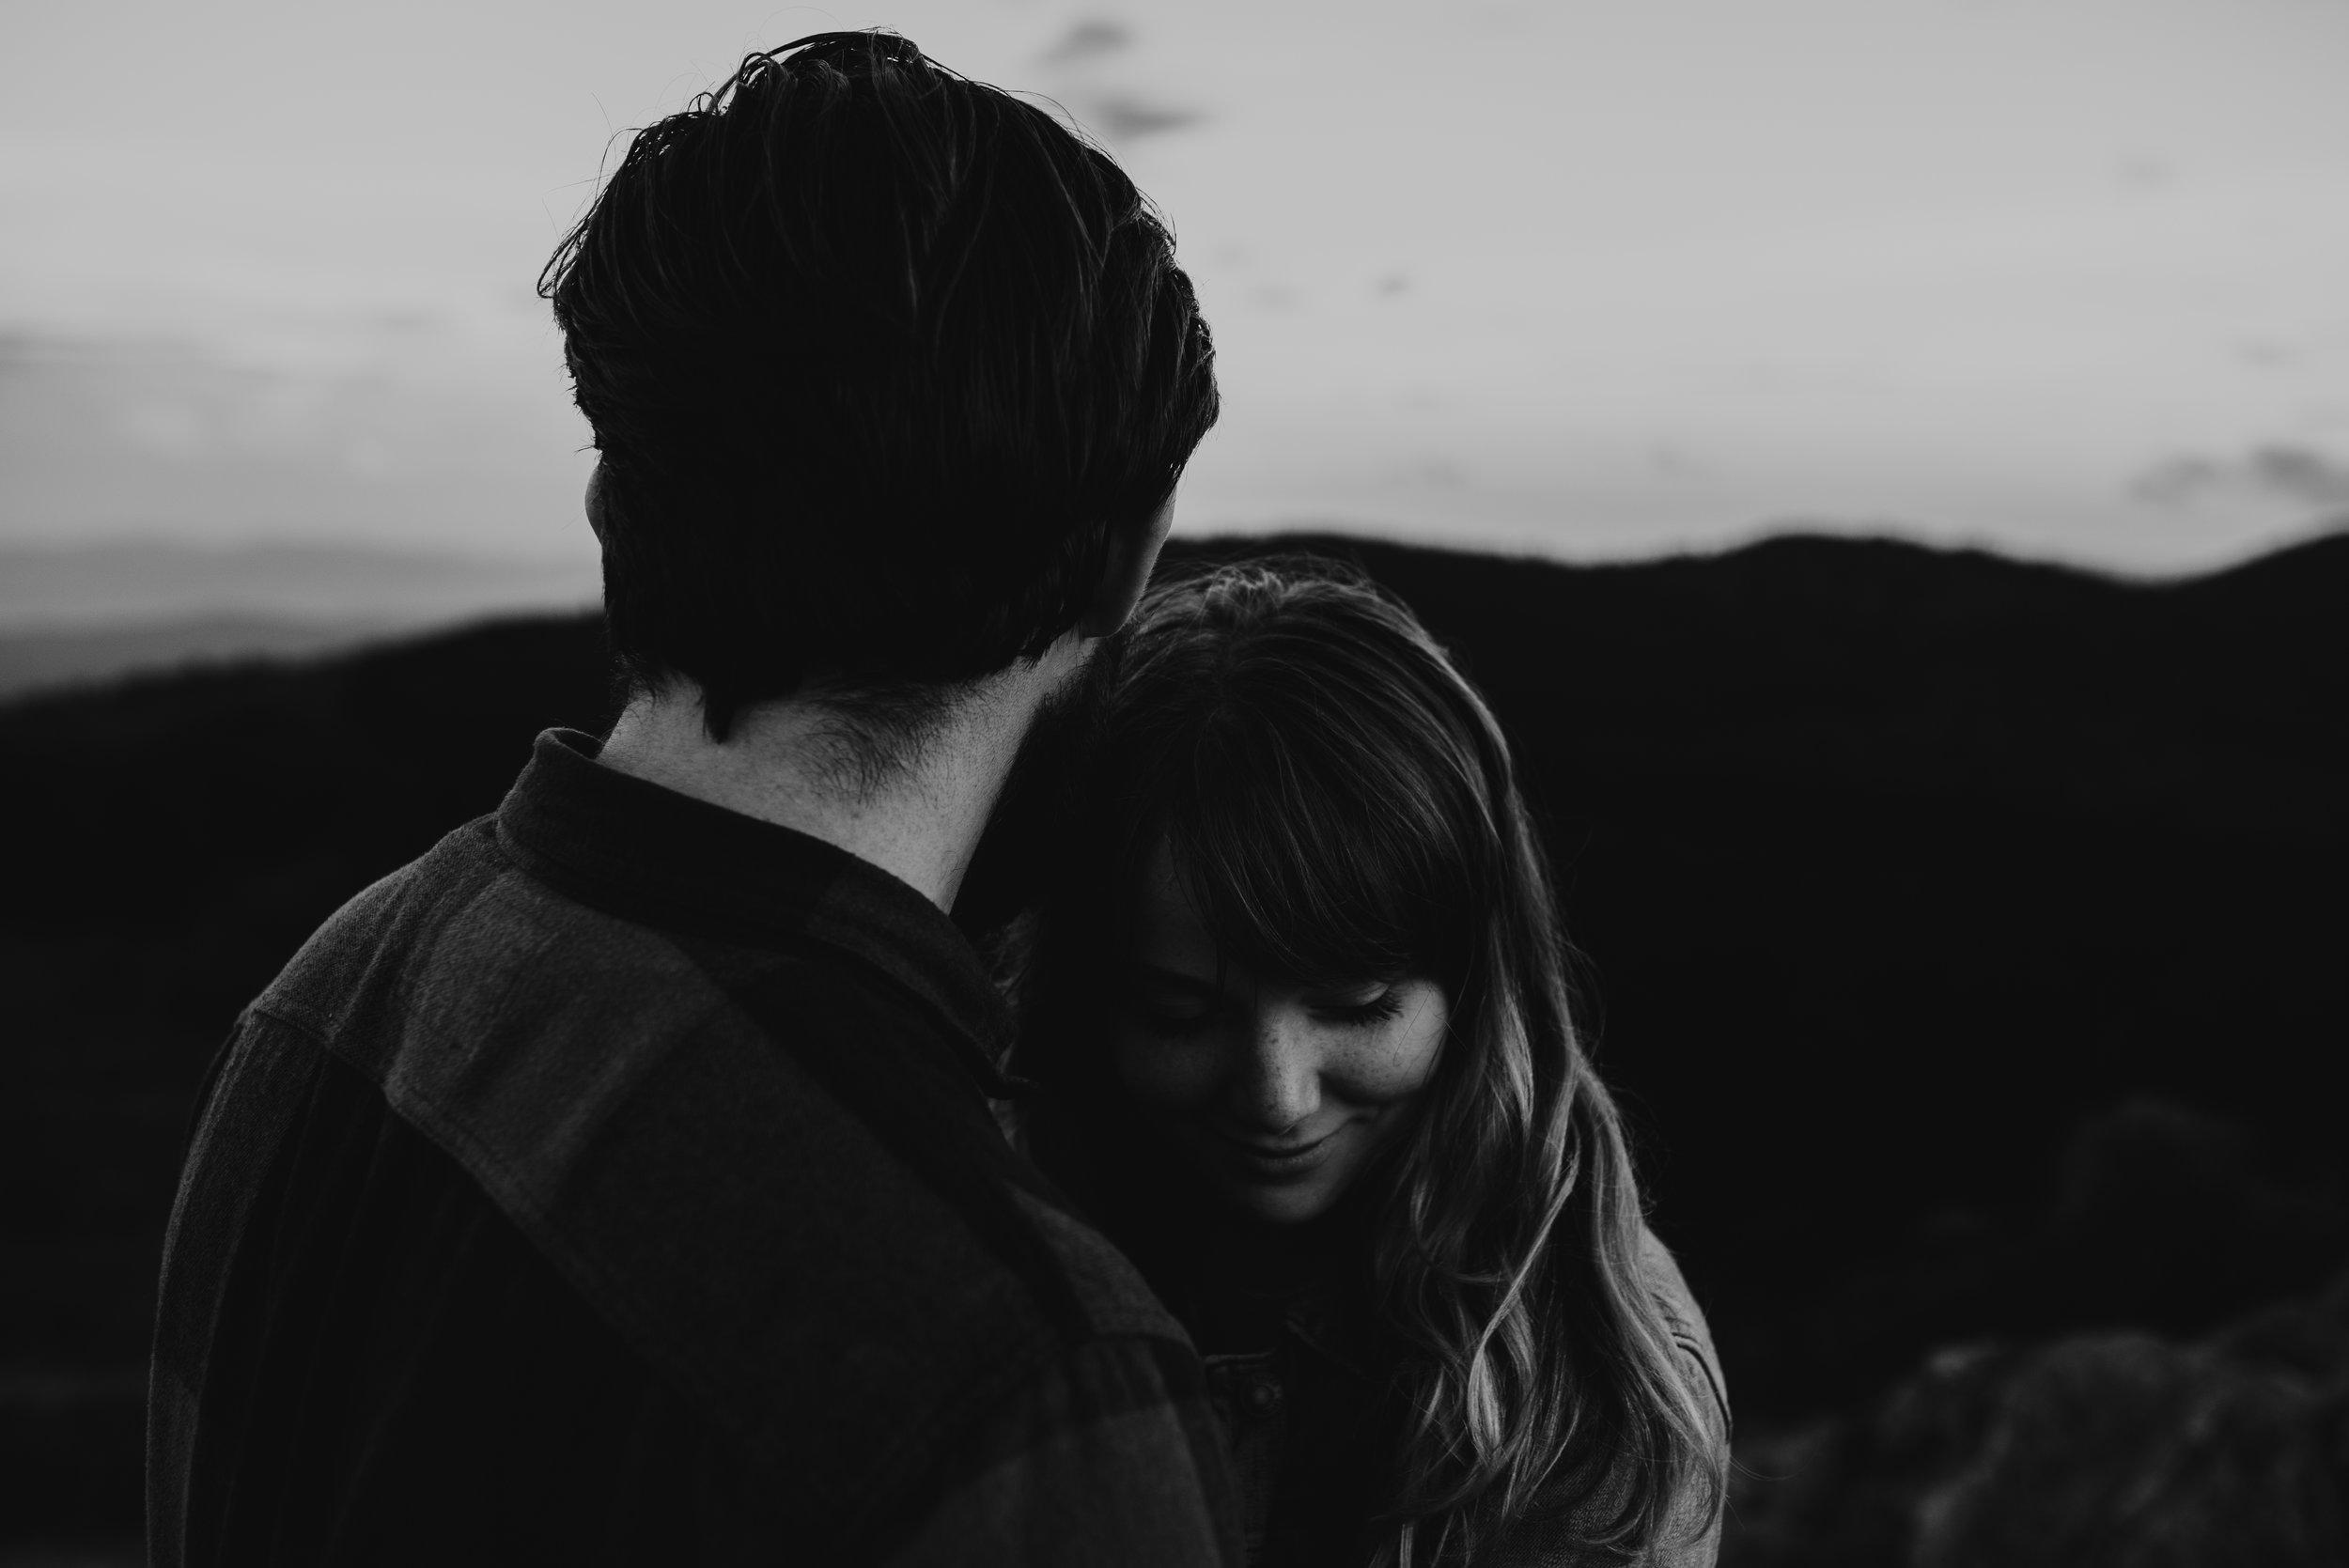 leah-joe-middleton-asheville-north-carolina-couple-session-destination-elopement-photographer-fox-and-film-184.jpg